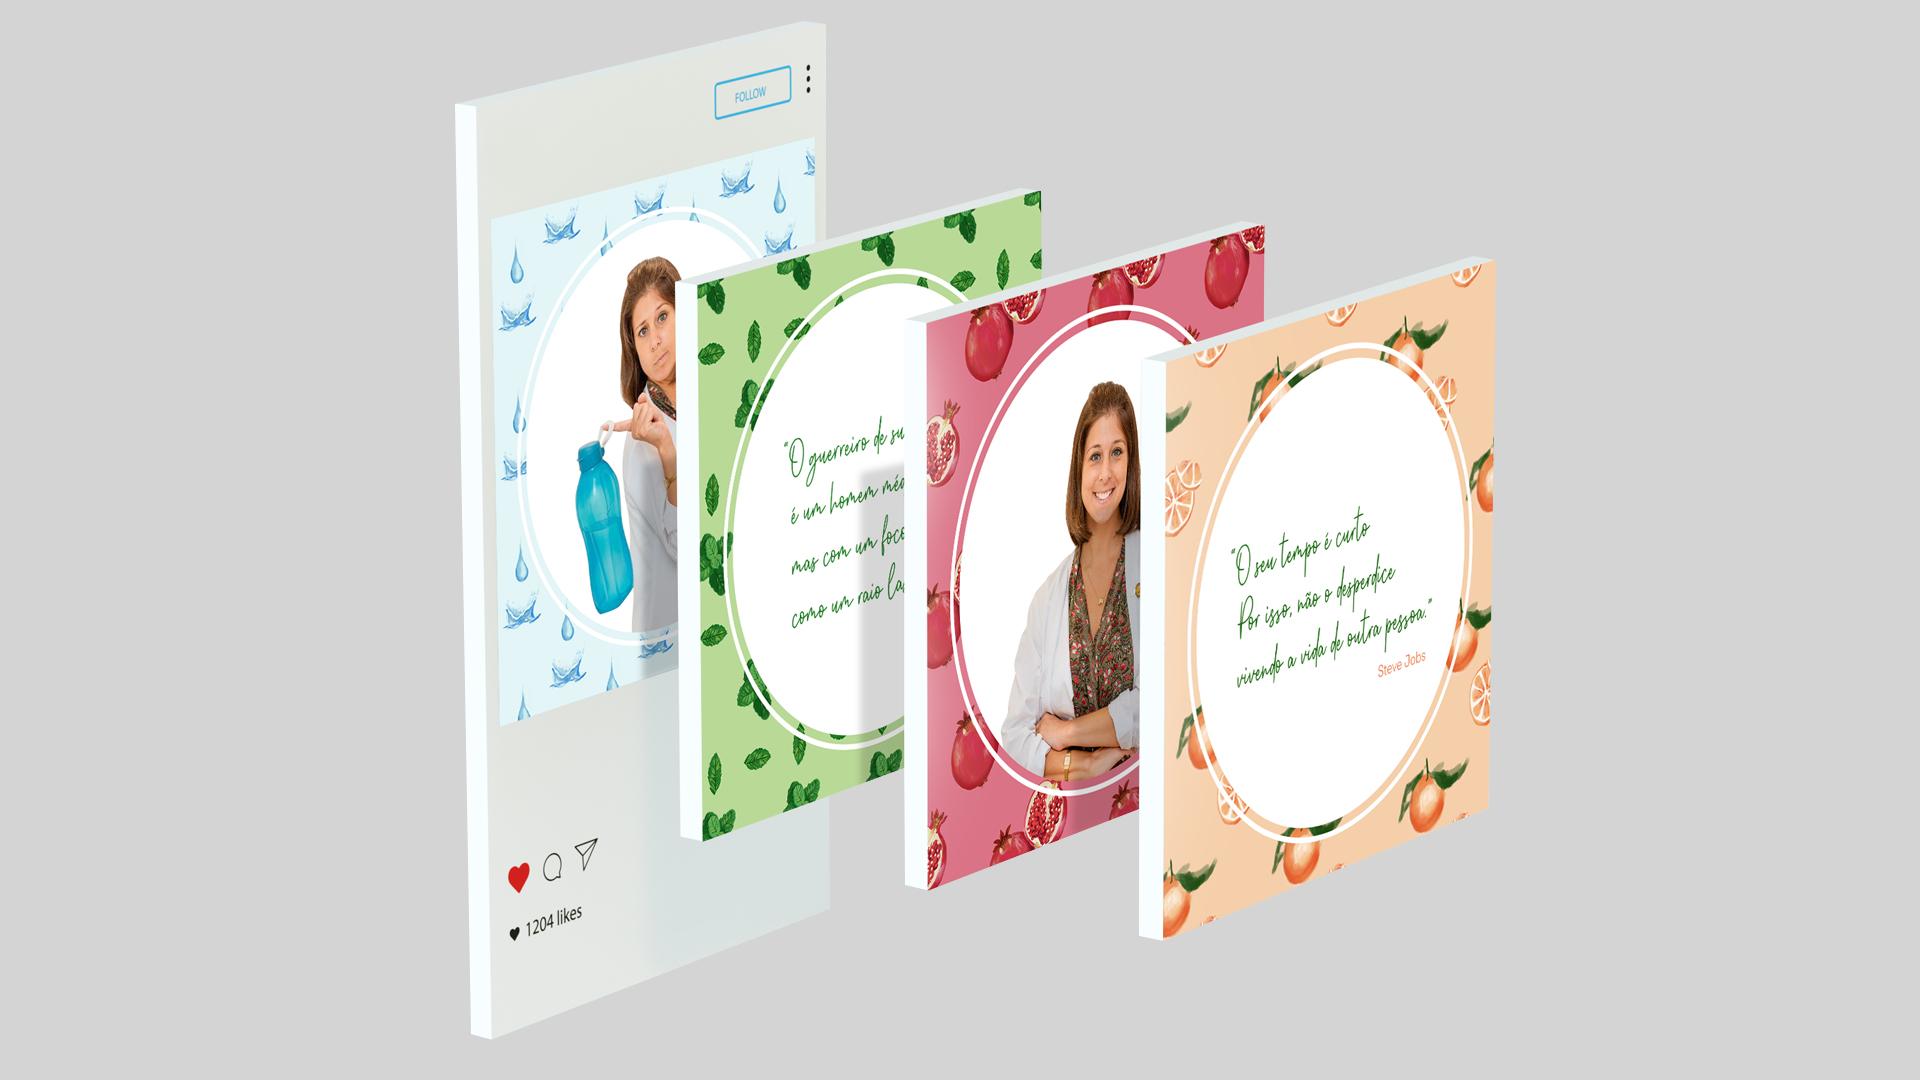 Wellness Brand Design - Nutritionist Identity in Social Media posts